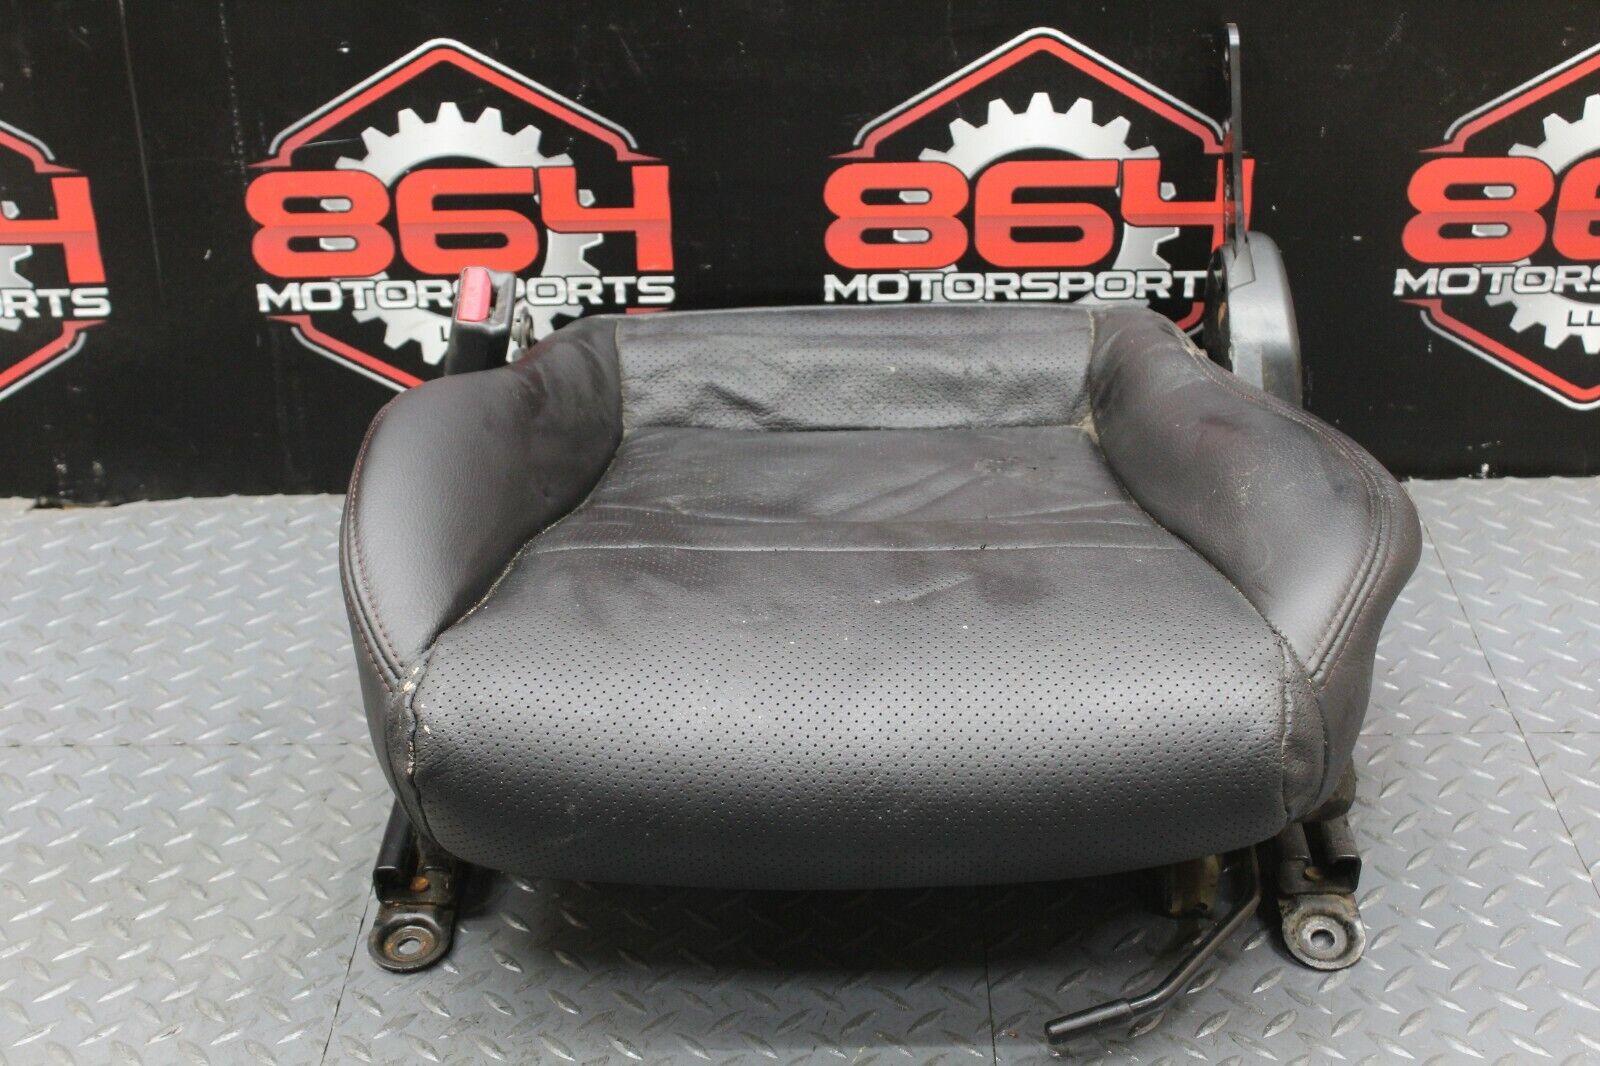 Honda Genuine 81131-SJC-A51ZB Seat Cushion Trim Cover Front Right